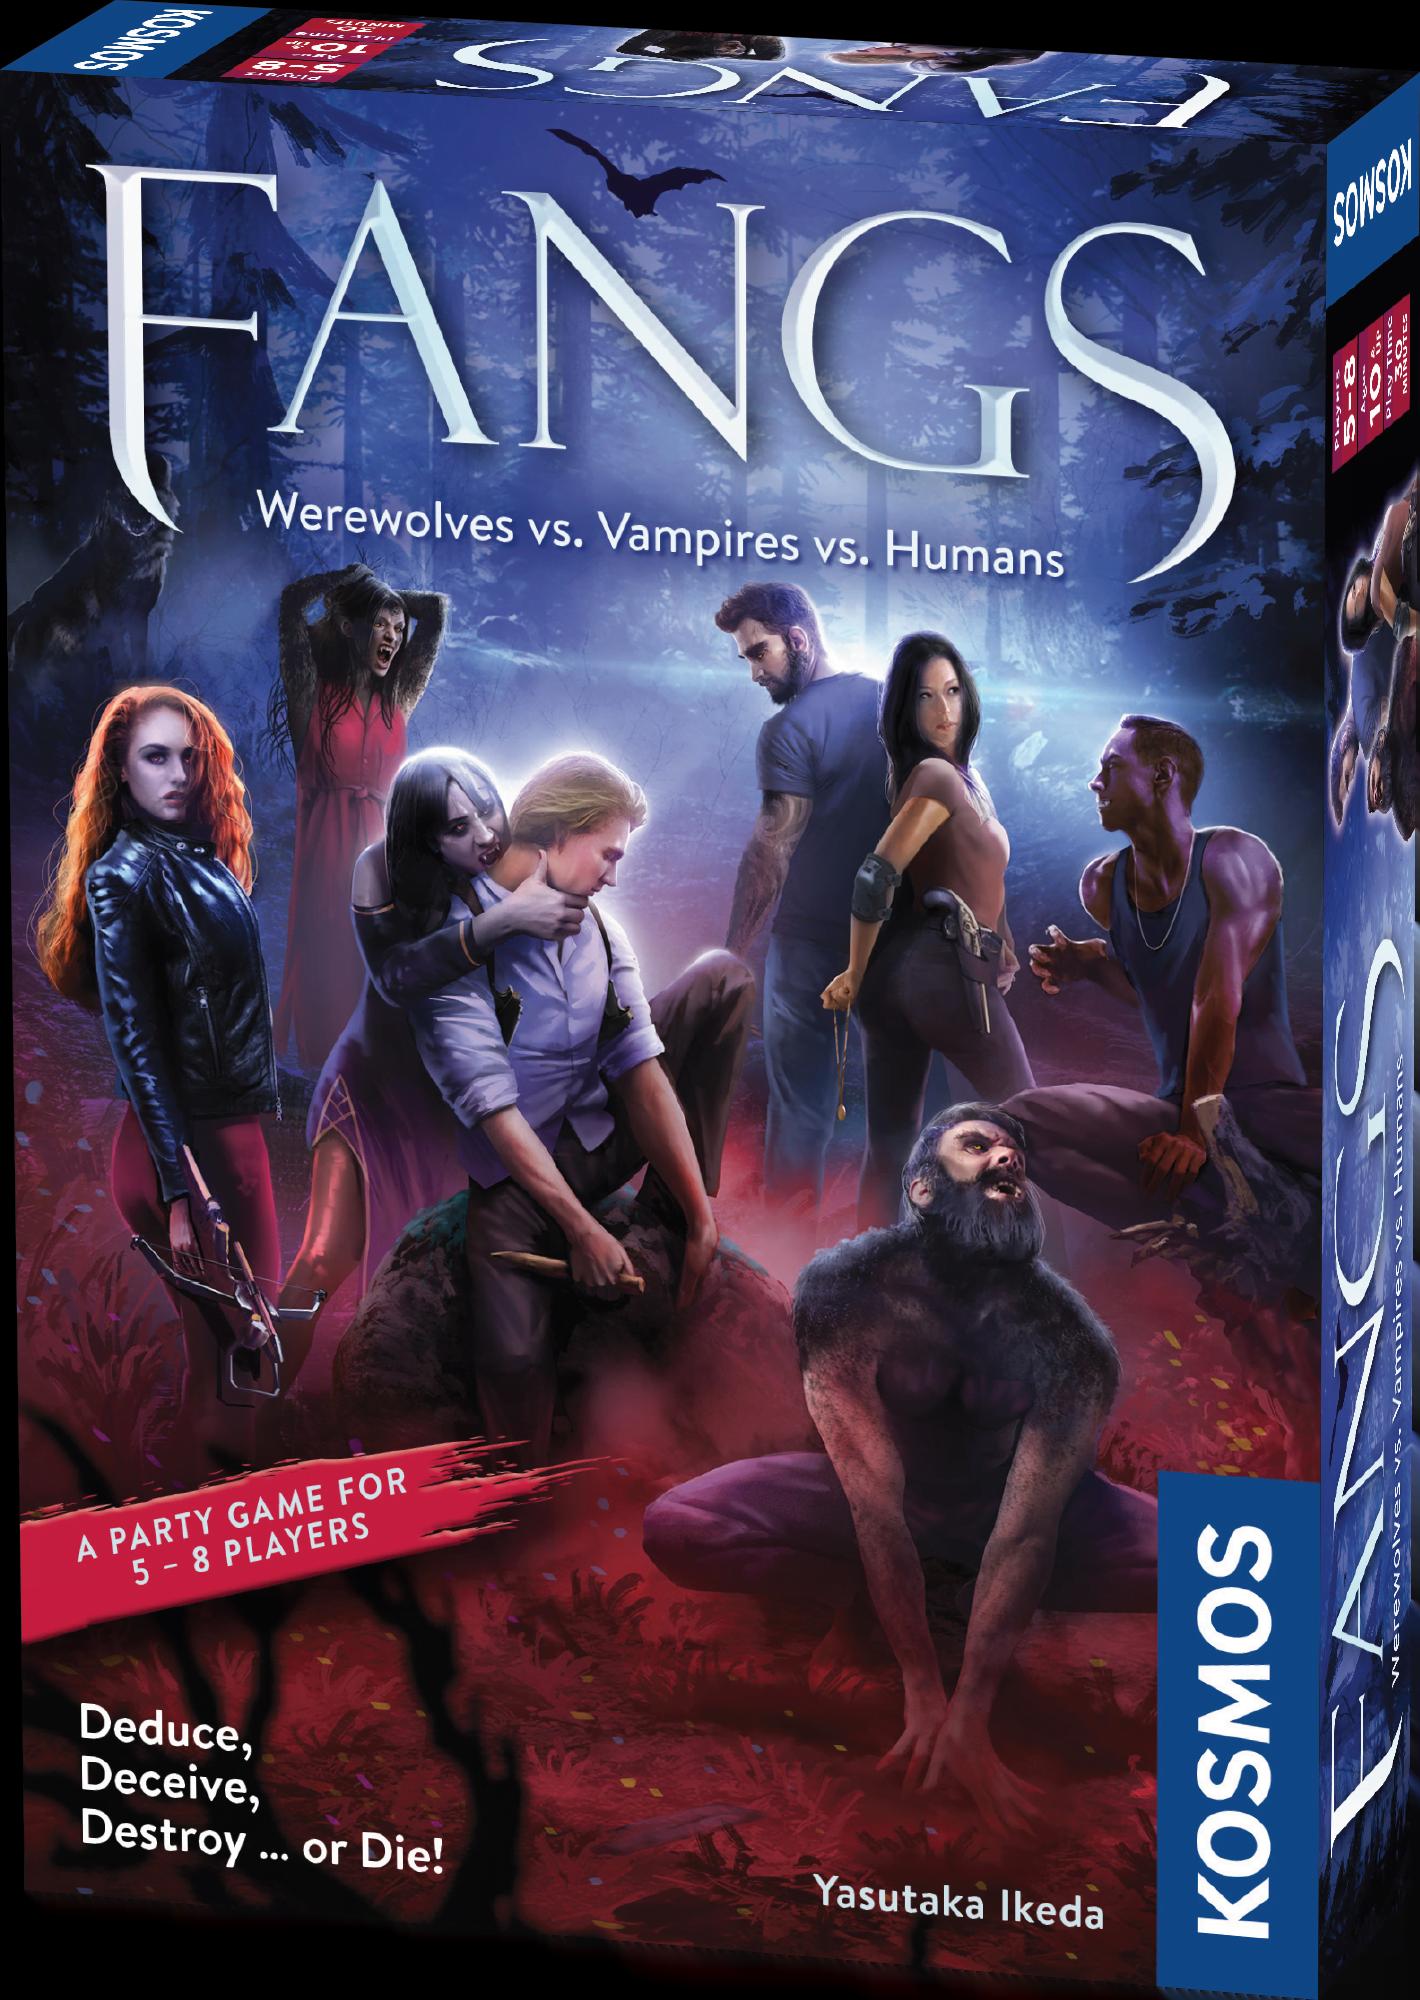 Fangs: Werewolves vs. Vampires vs. Humans -  Thames and Kosmos